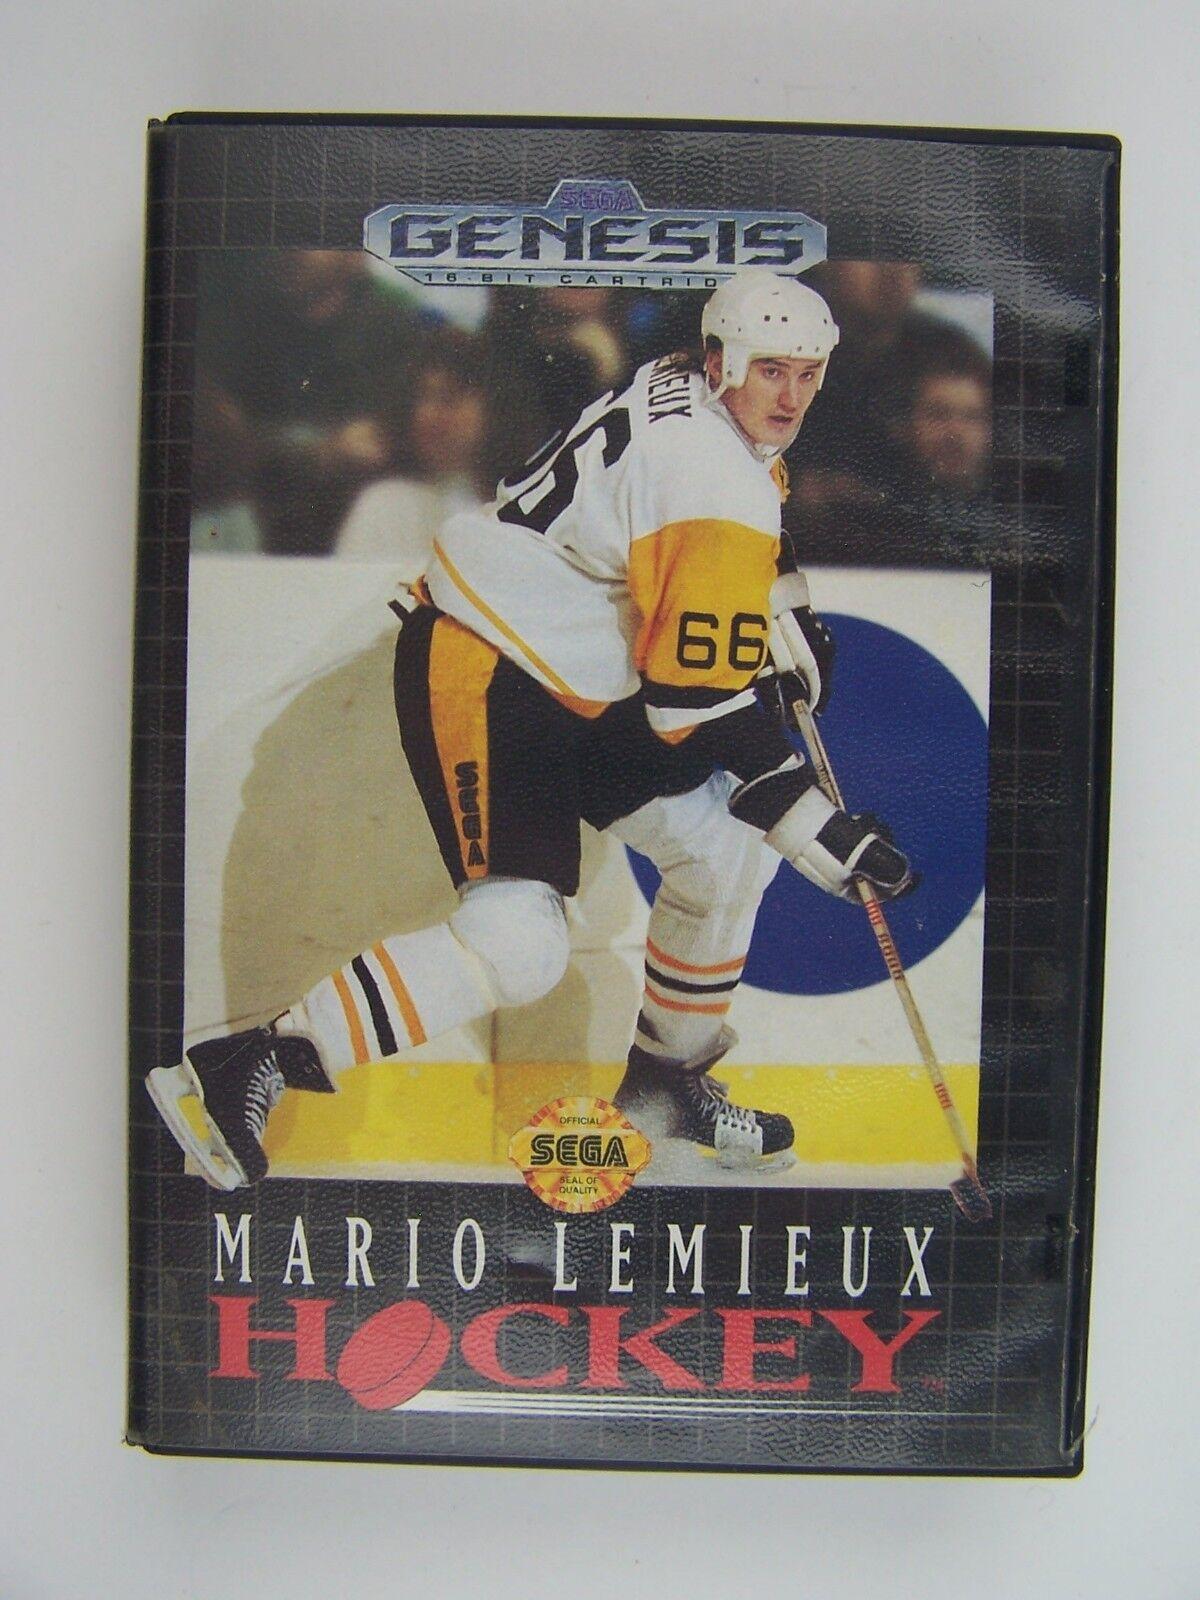 Mario Lemieux Hockey Sega Genesis Game & Cartridge